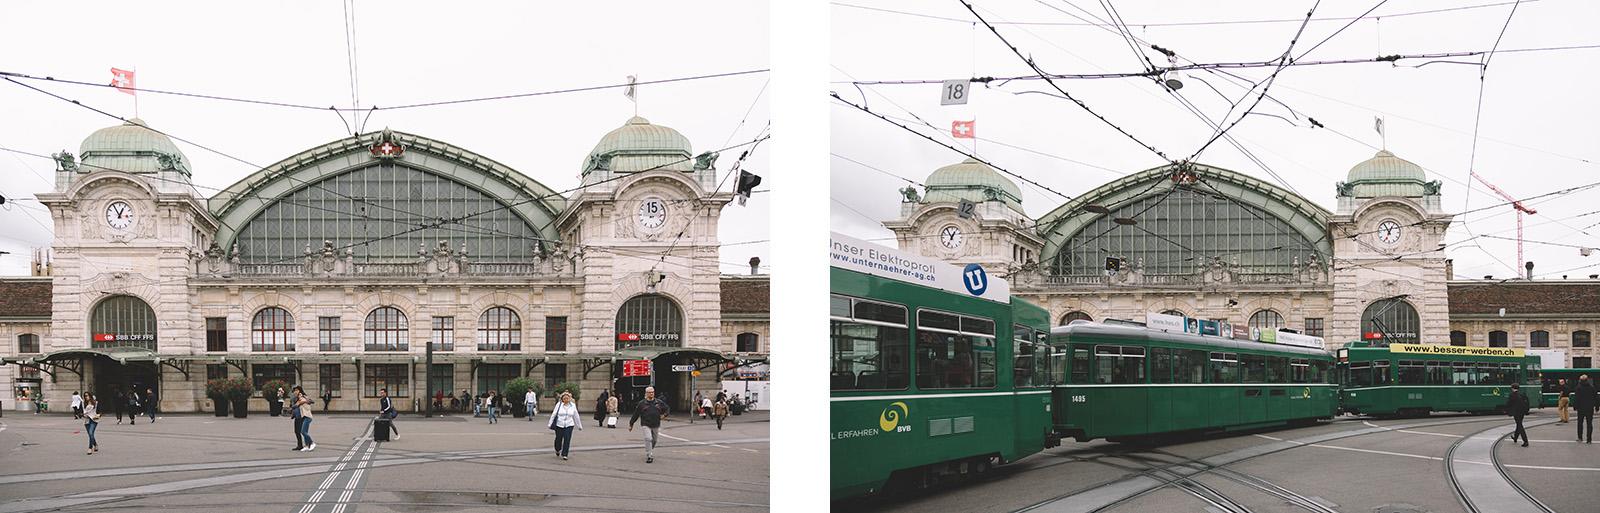 Basel Switzerland Railway Station